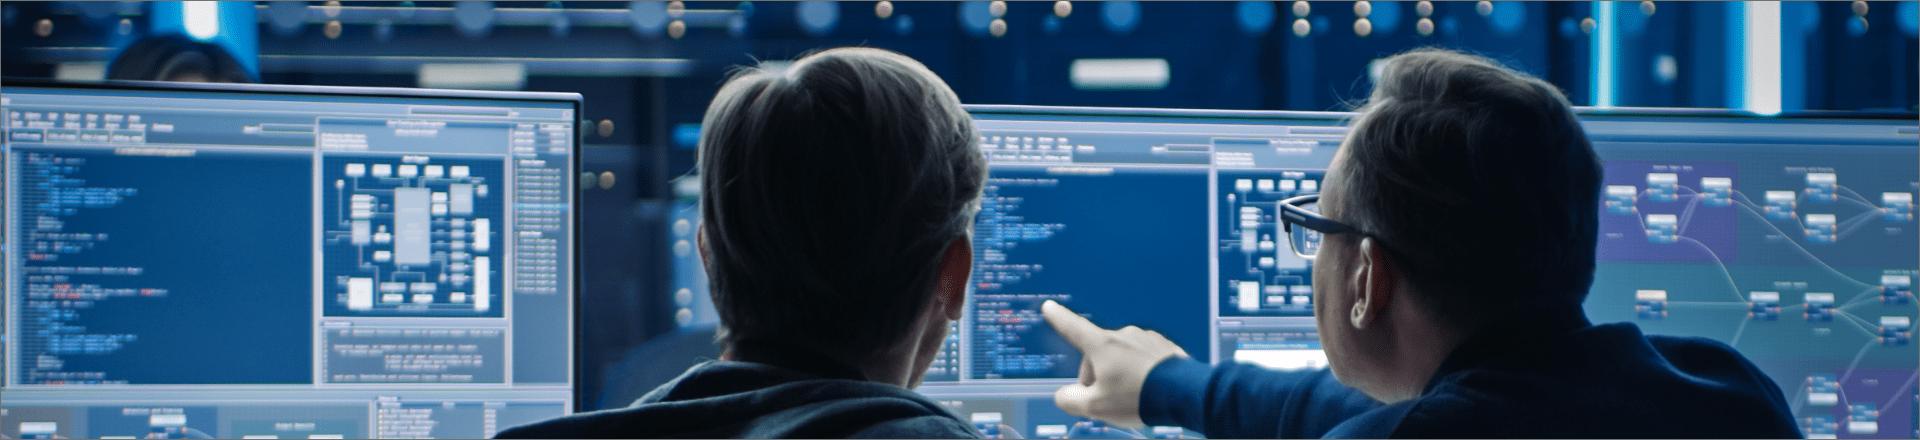 Two men monitoring a computer screen